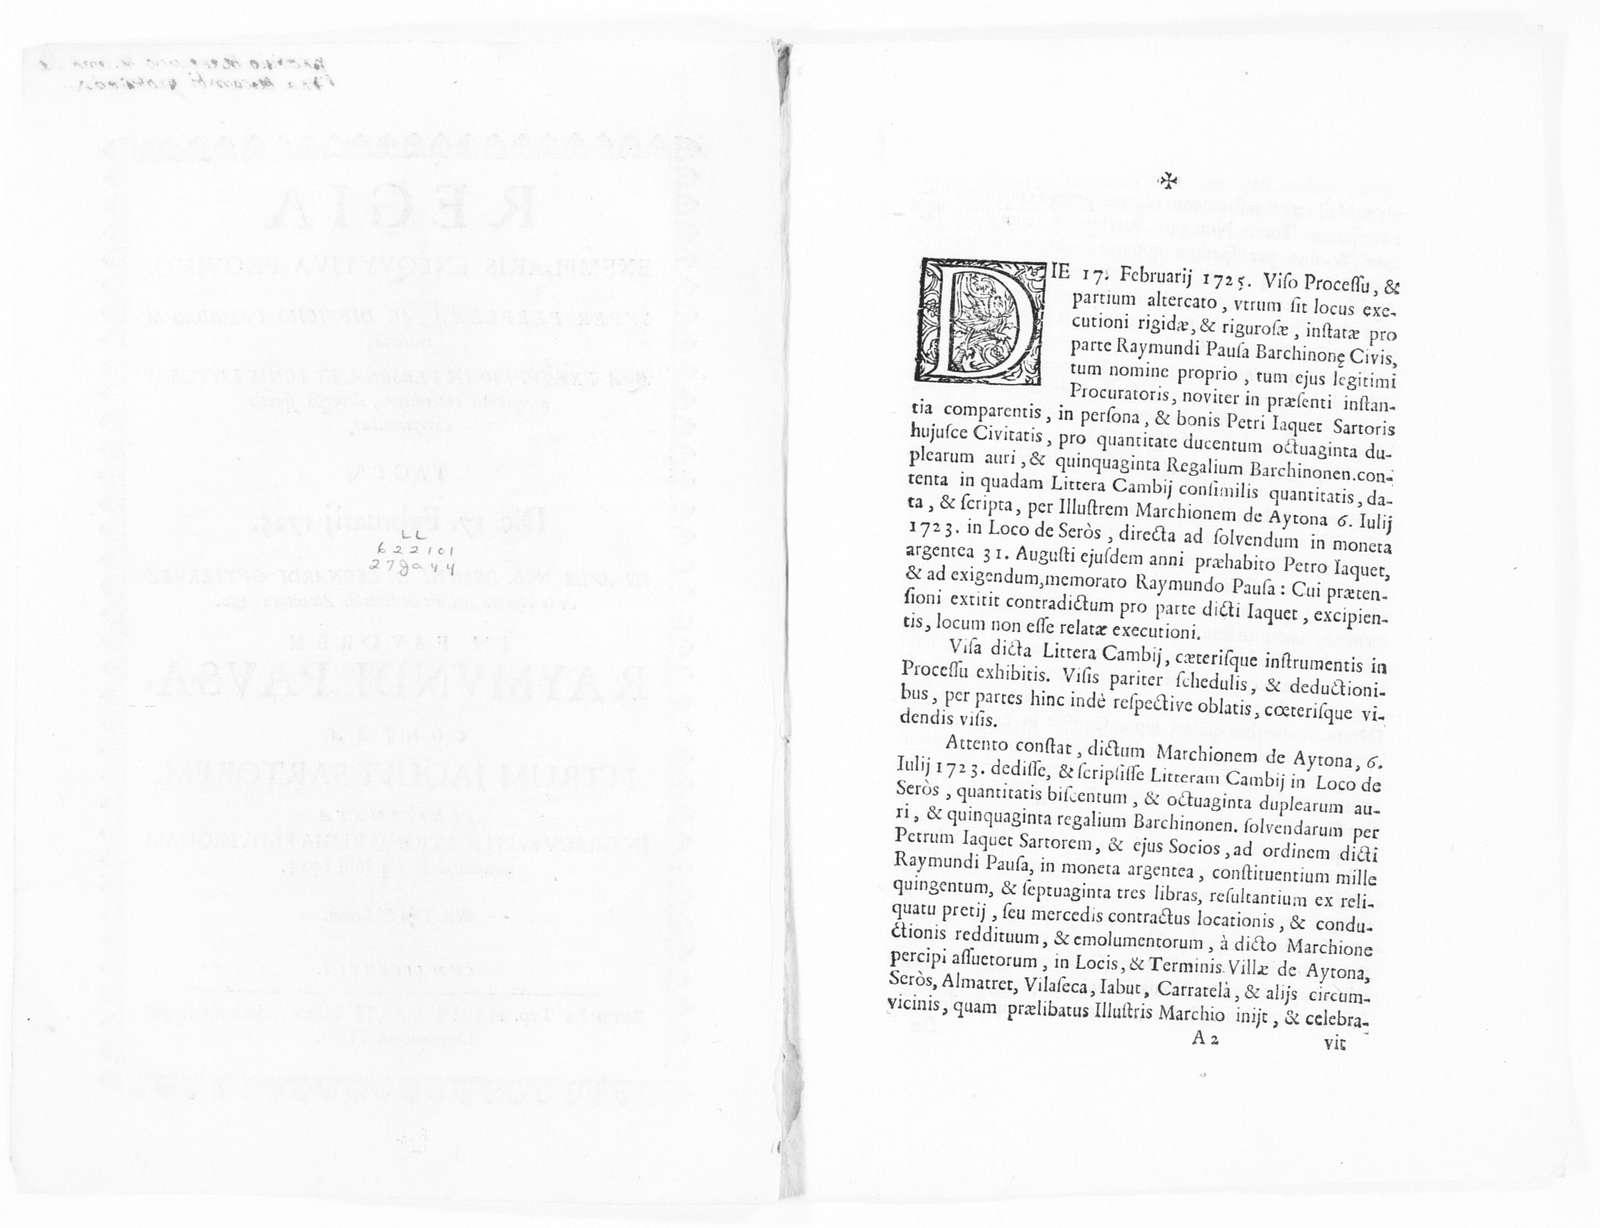 Royal Judgment of February 17, 1725 issued by Leonardo Gutiérrez on behalf Raimundo Pausa in the case against Pedro Jaquet Sartor, concerning payment of certain monetary debt